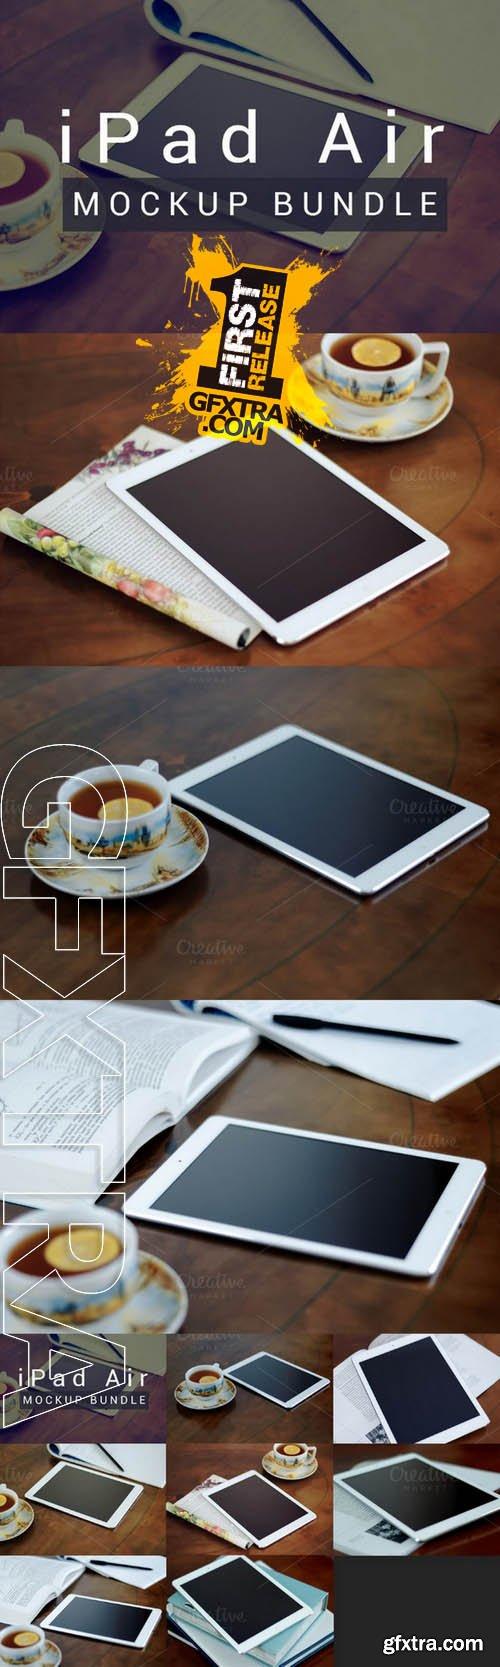 iPad Air - Photo Mockup Bundle - Creativemarket 102482